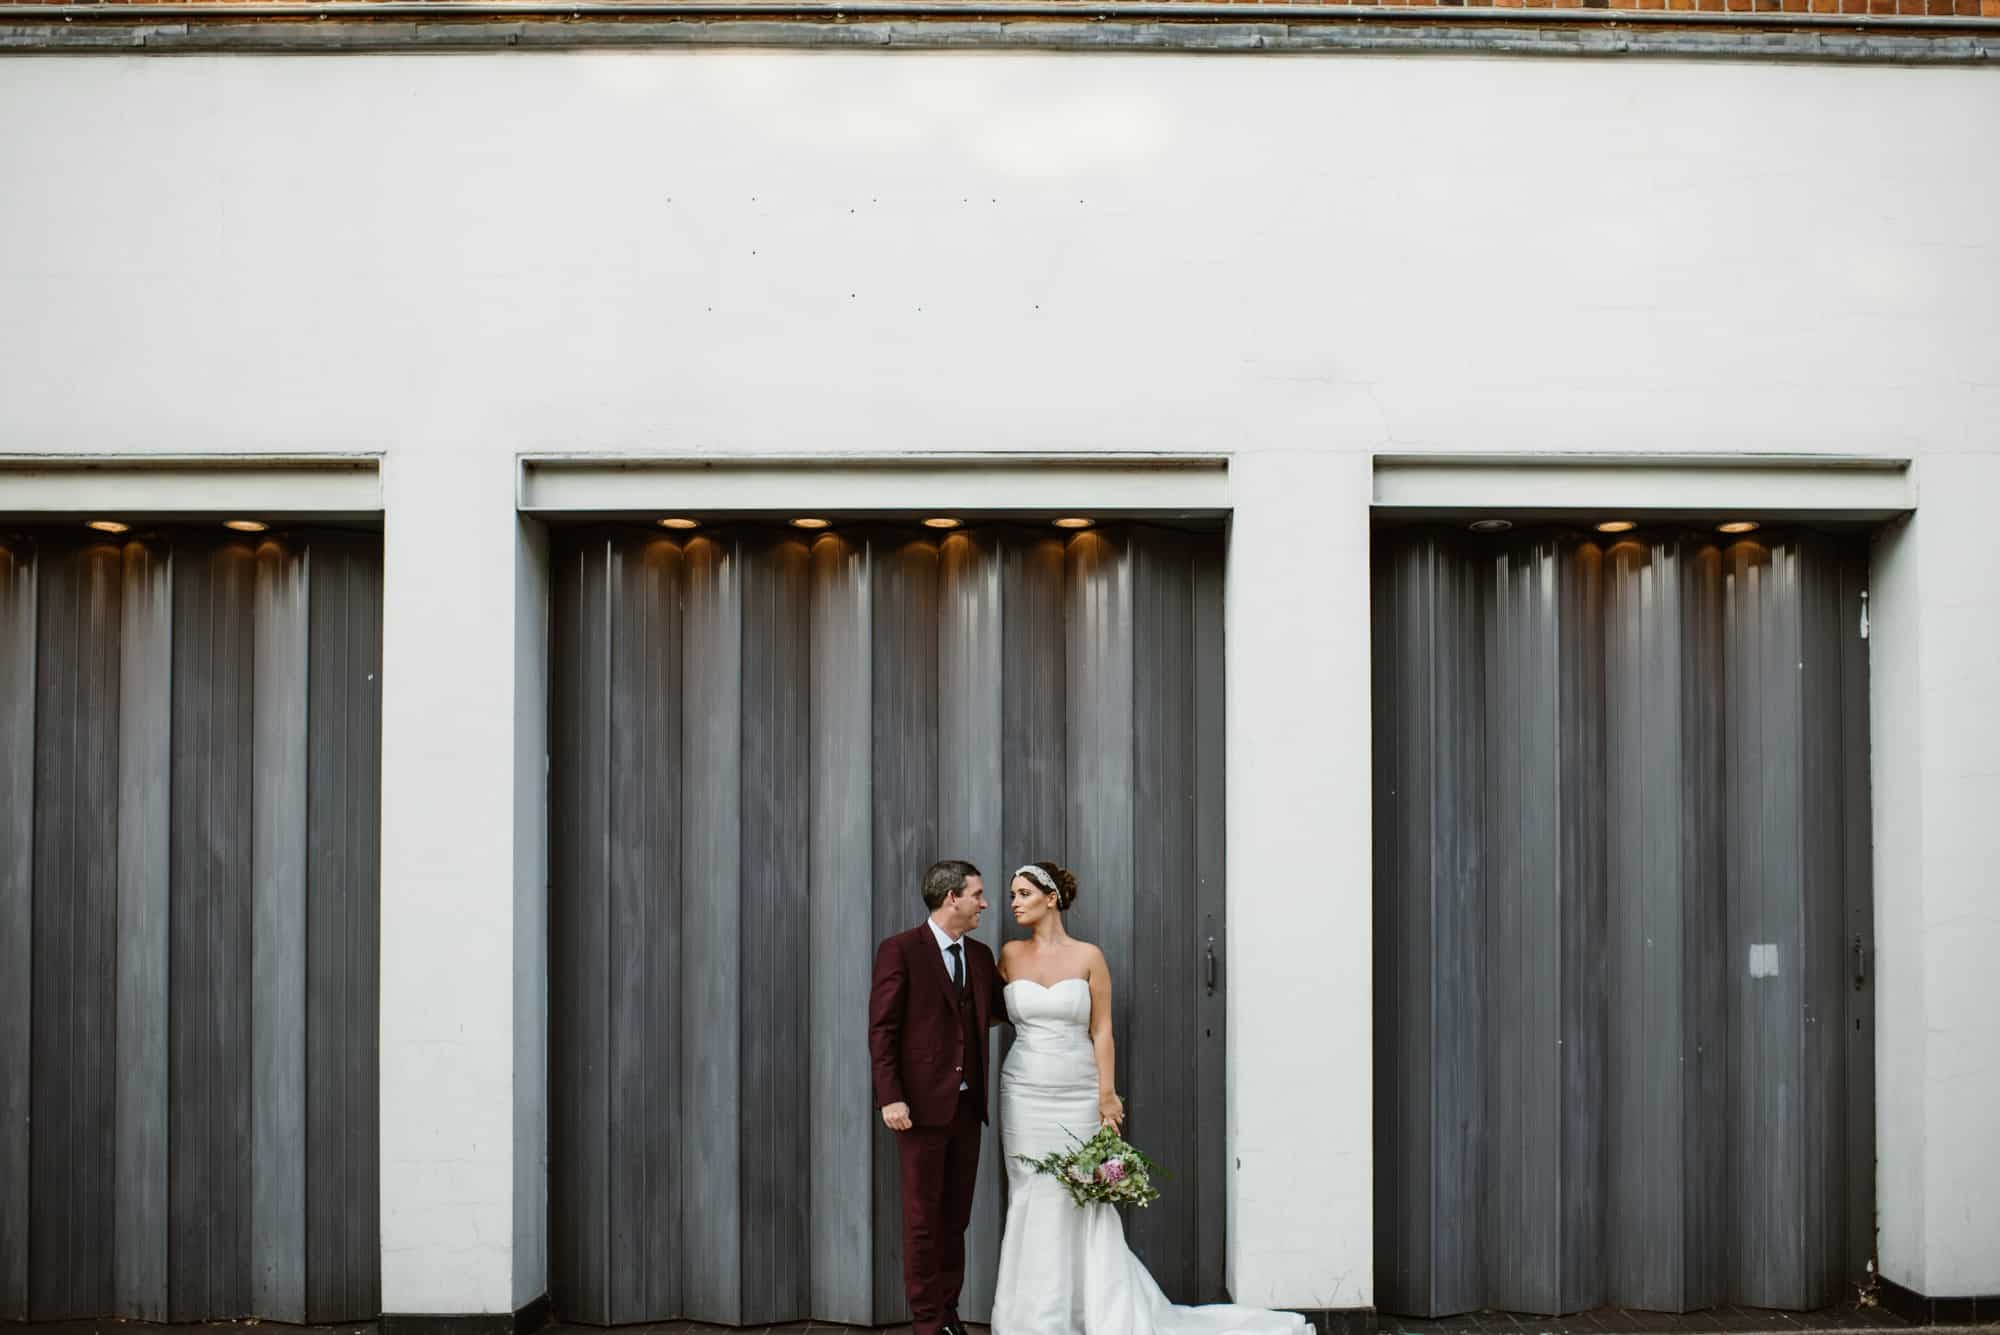 Sunbeam Studios Wedding Portrait with couple